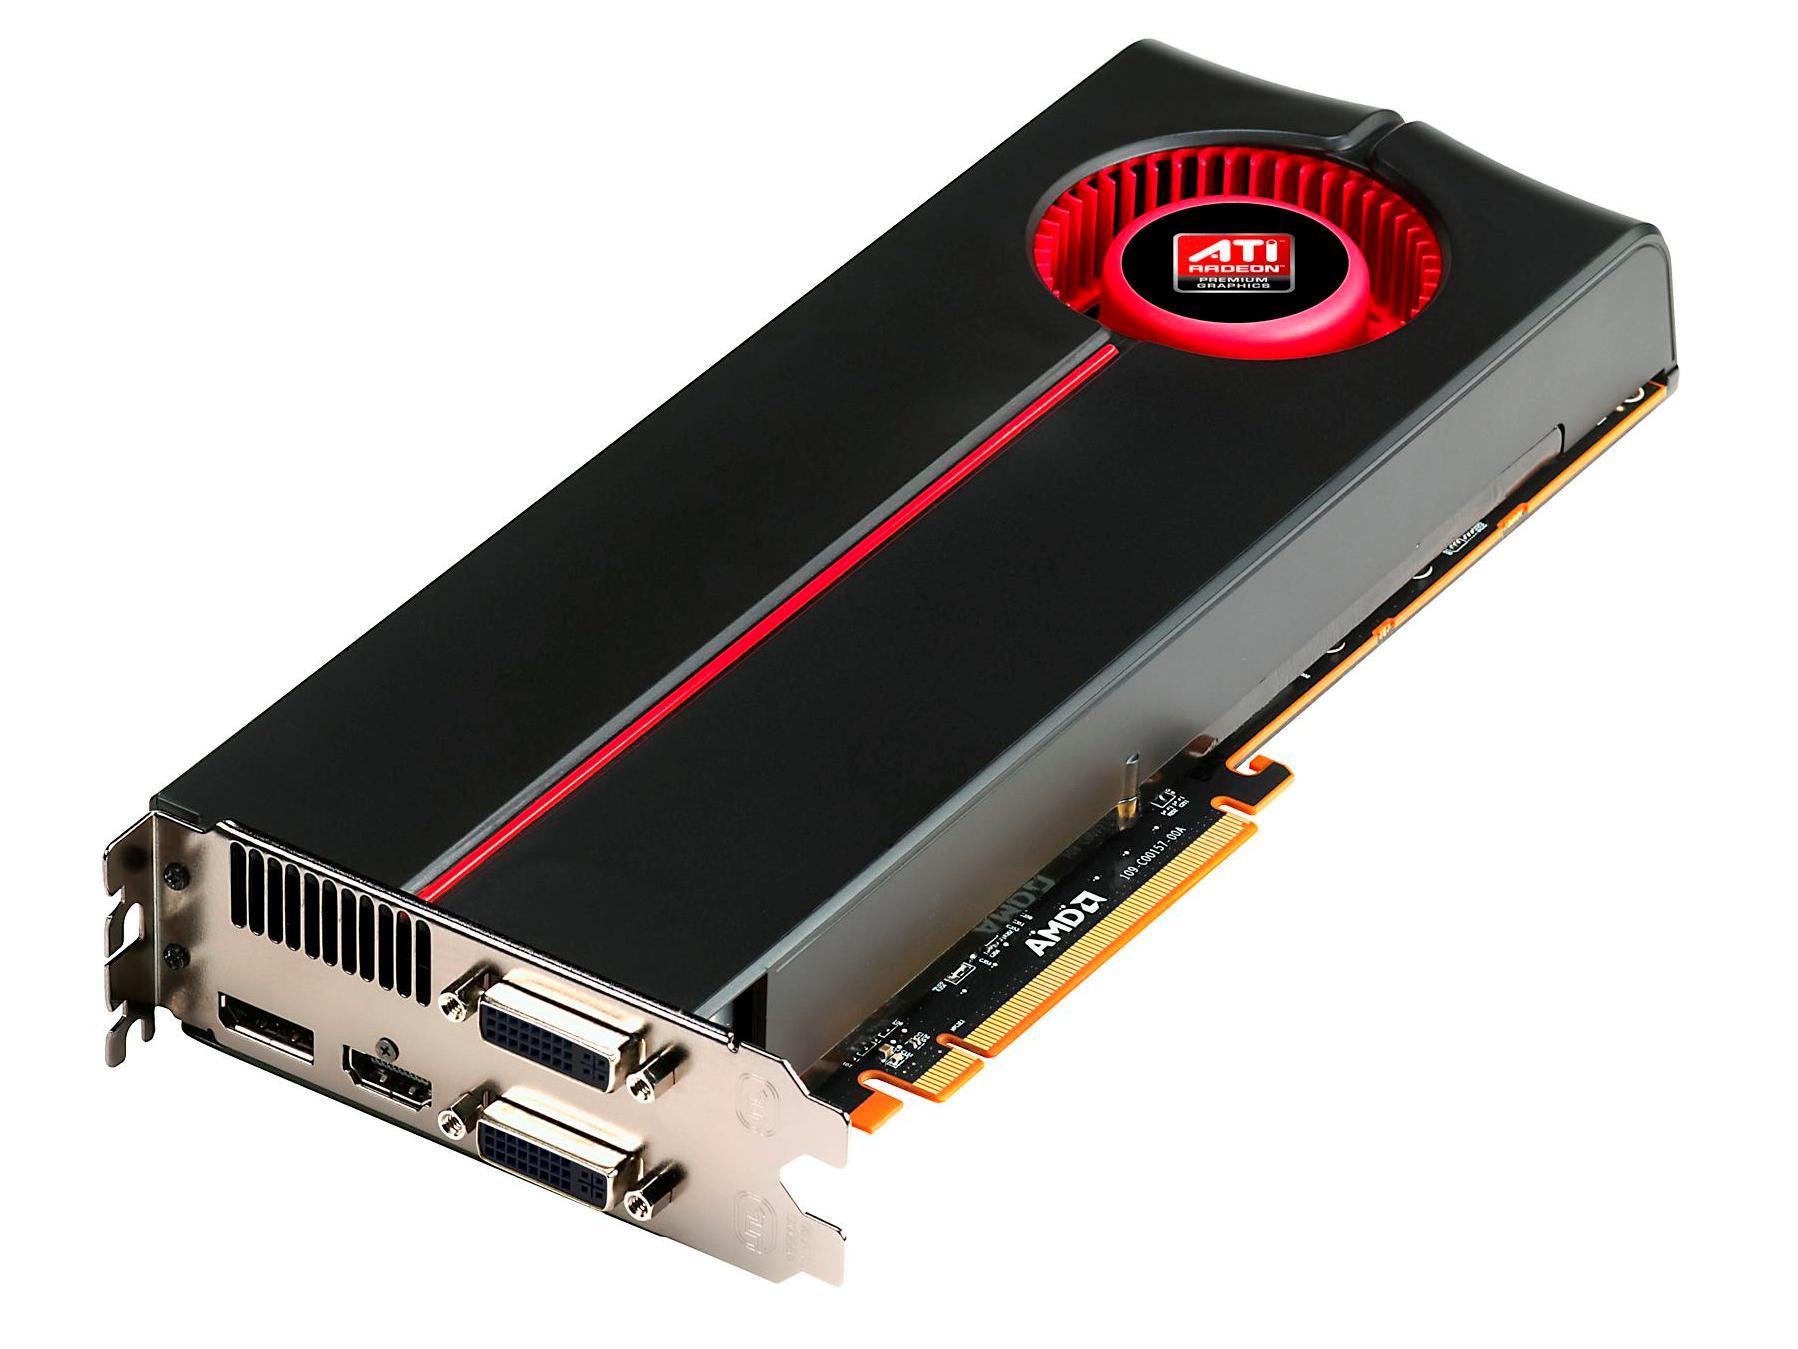 ATI Radeon HD 5870 review | TechRadar